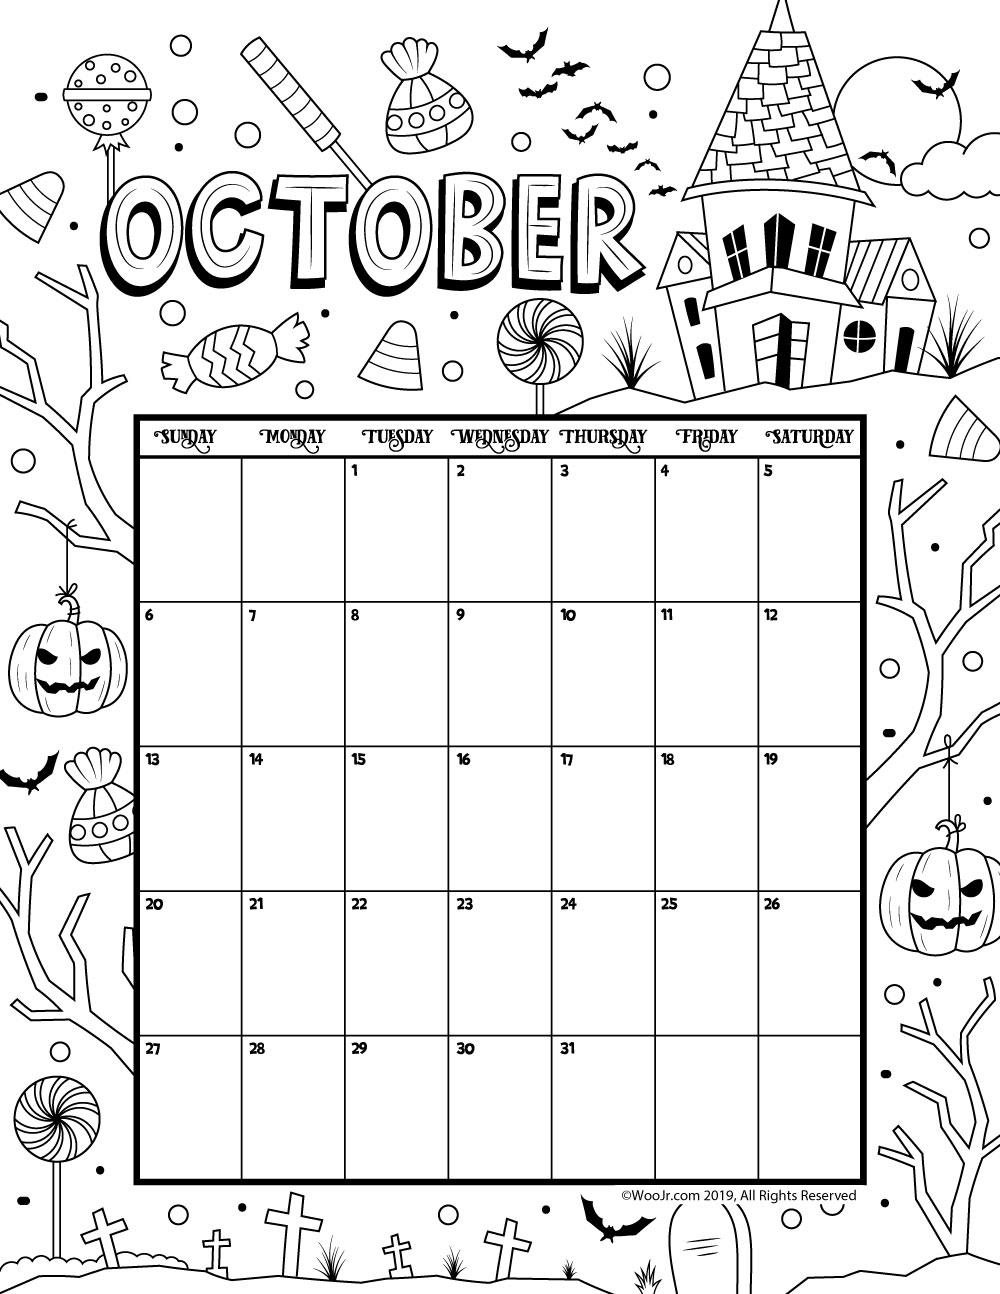 October Calendar 2019.October 2019 Coloring Calendar Woo Jr Kids Activities